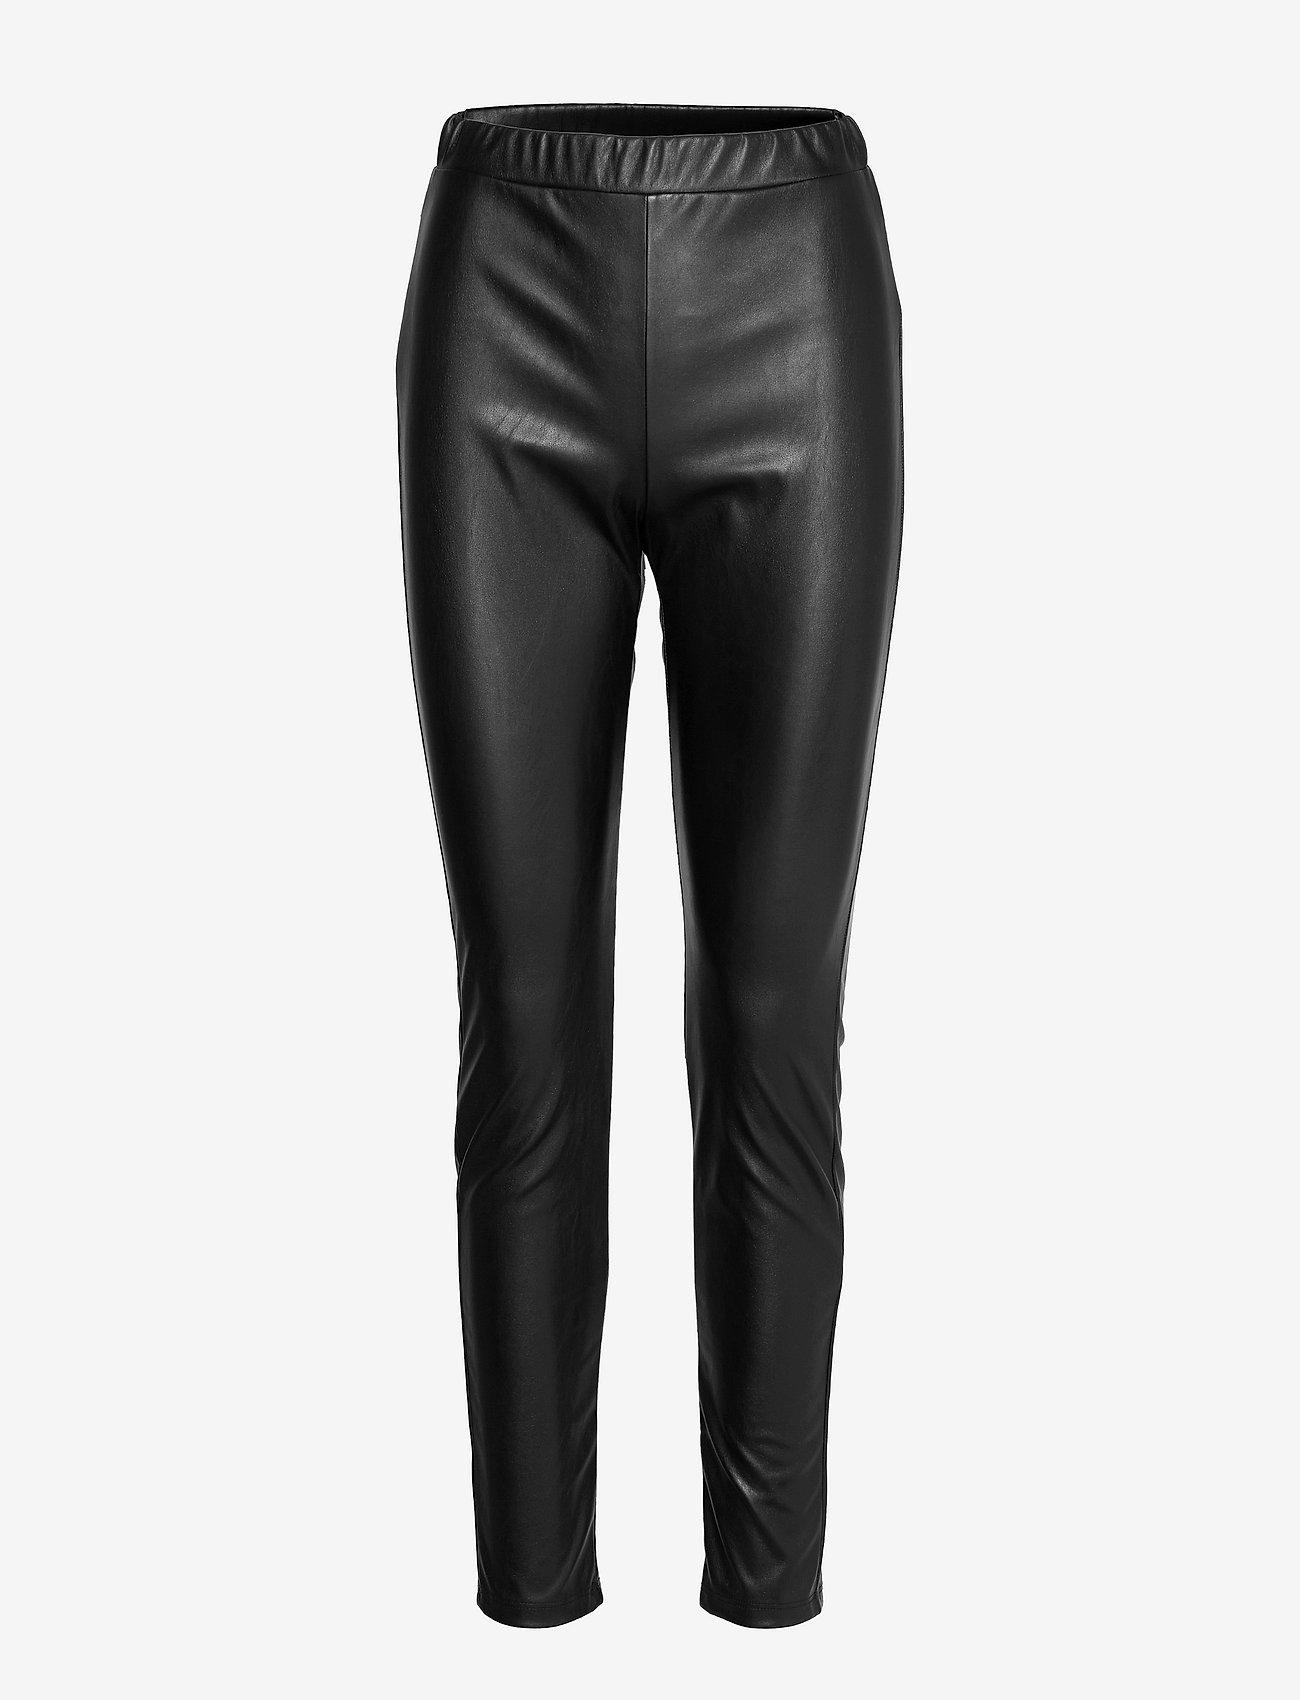 Max Mara Leisure - RANGHI - leather trousers - black - 0